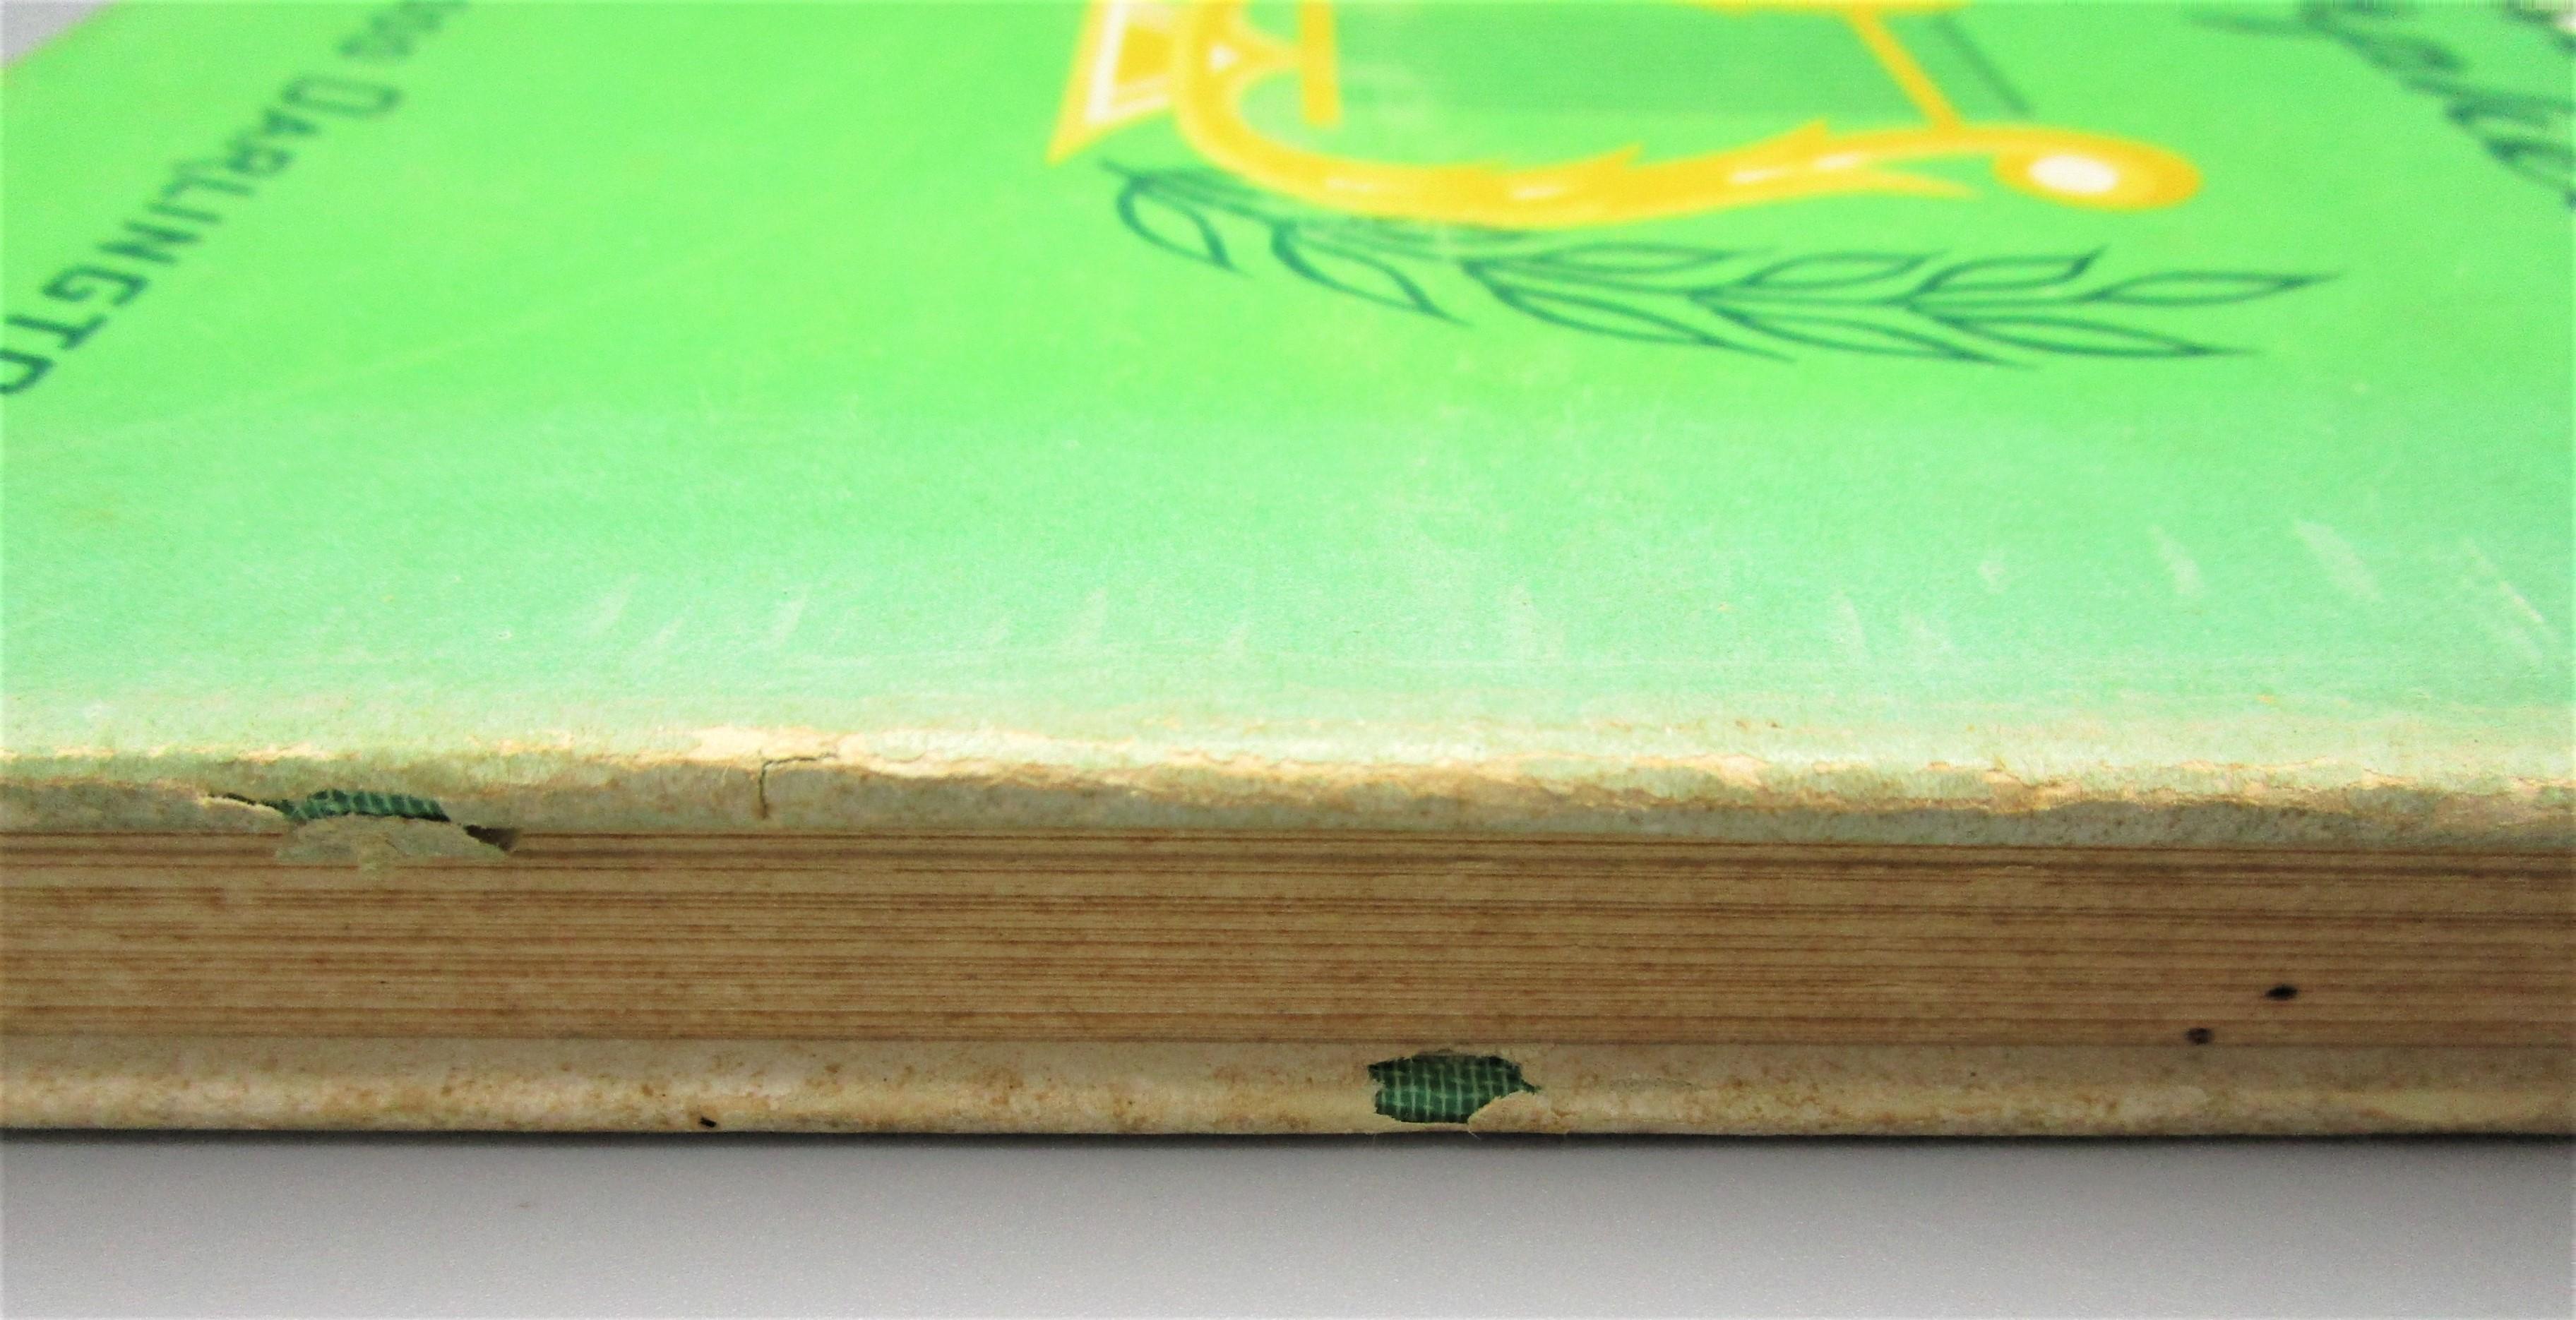 IRISH ORPHEUS: PATRICK S. GILMORE, by Marwood Darlington - 1950 [Signed]